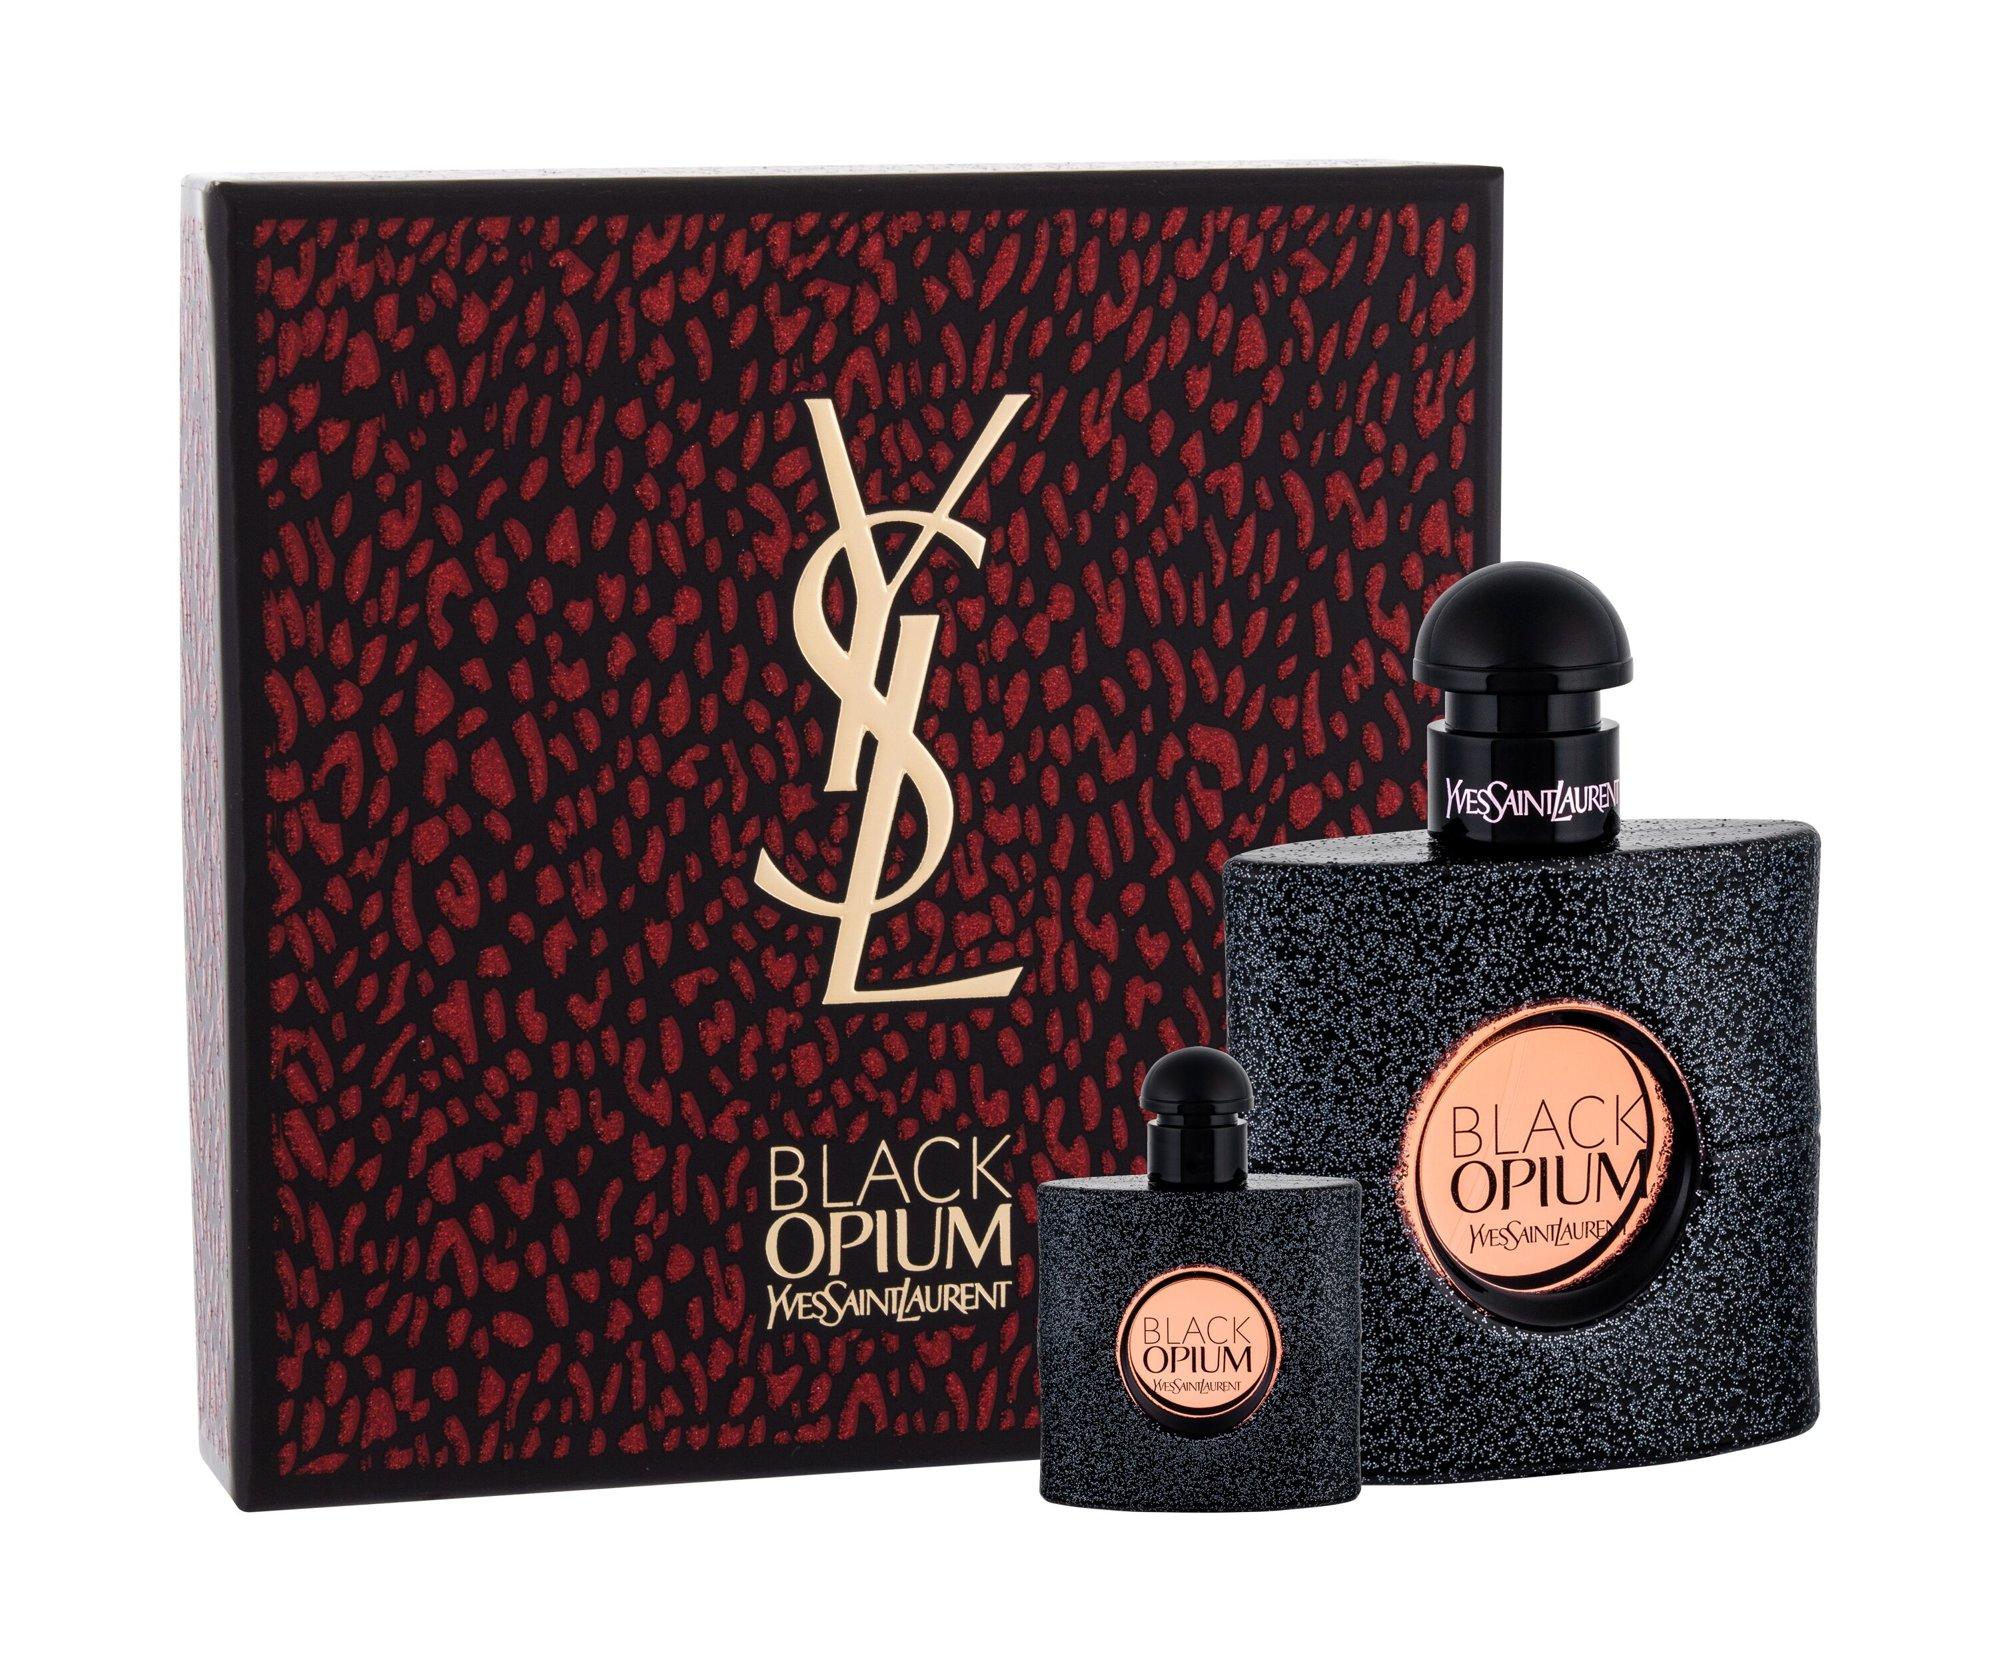 Yves Saint Laurent Black Opium, parfumovaná voda 50 ml + parfumovaná voda 7,5 ml